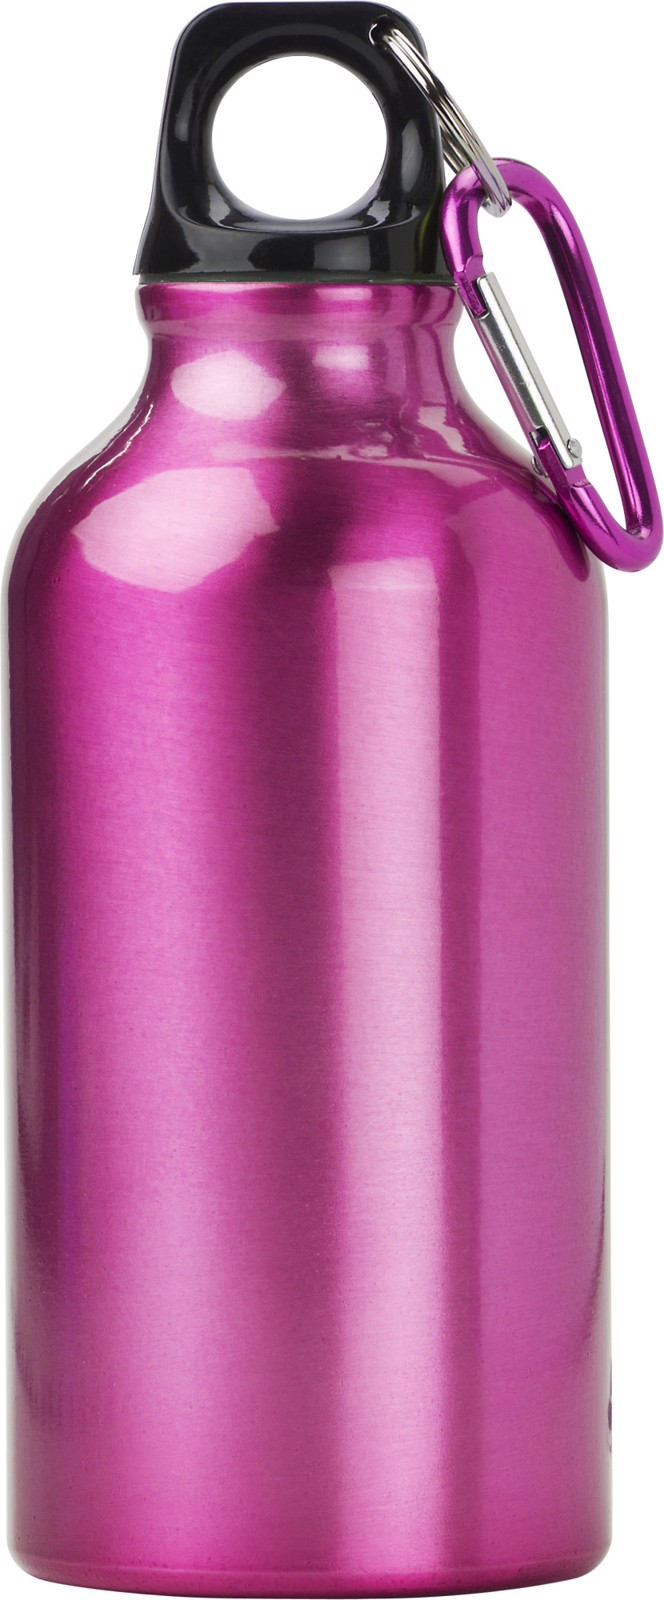 Aluminium bottle - Pink